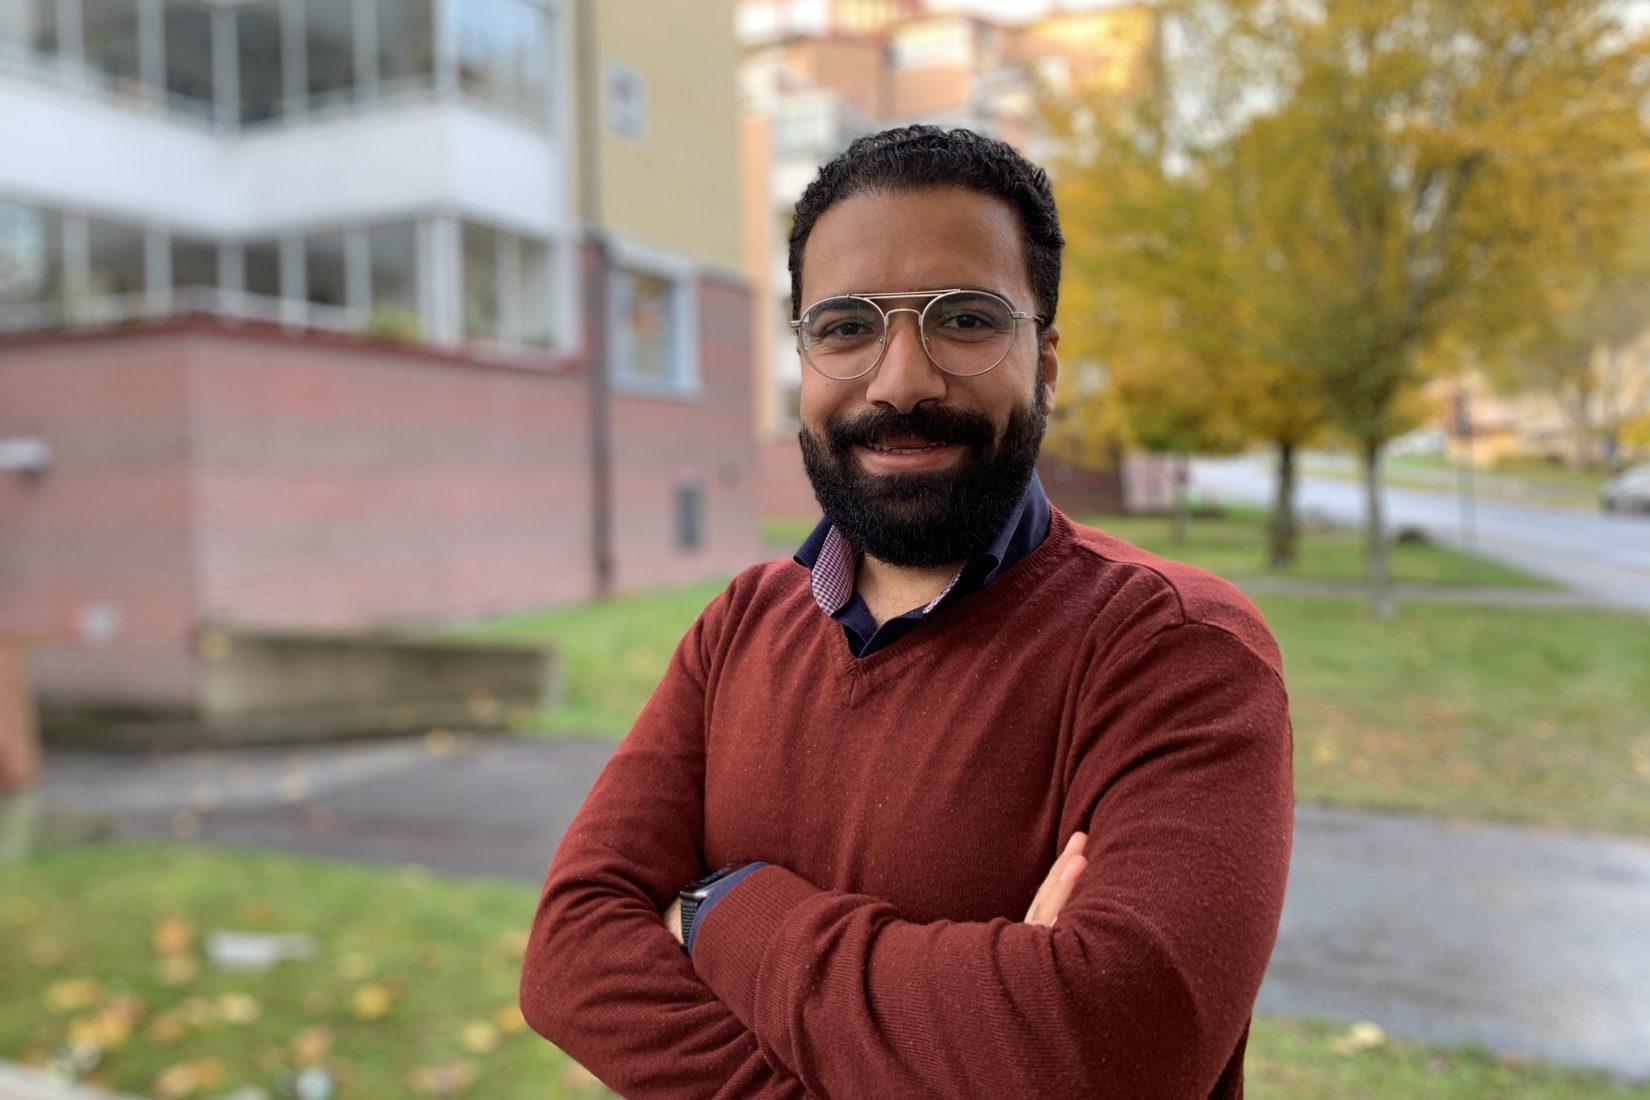 Swedish Institute scholarship holder Gerges Mousa